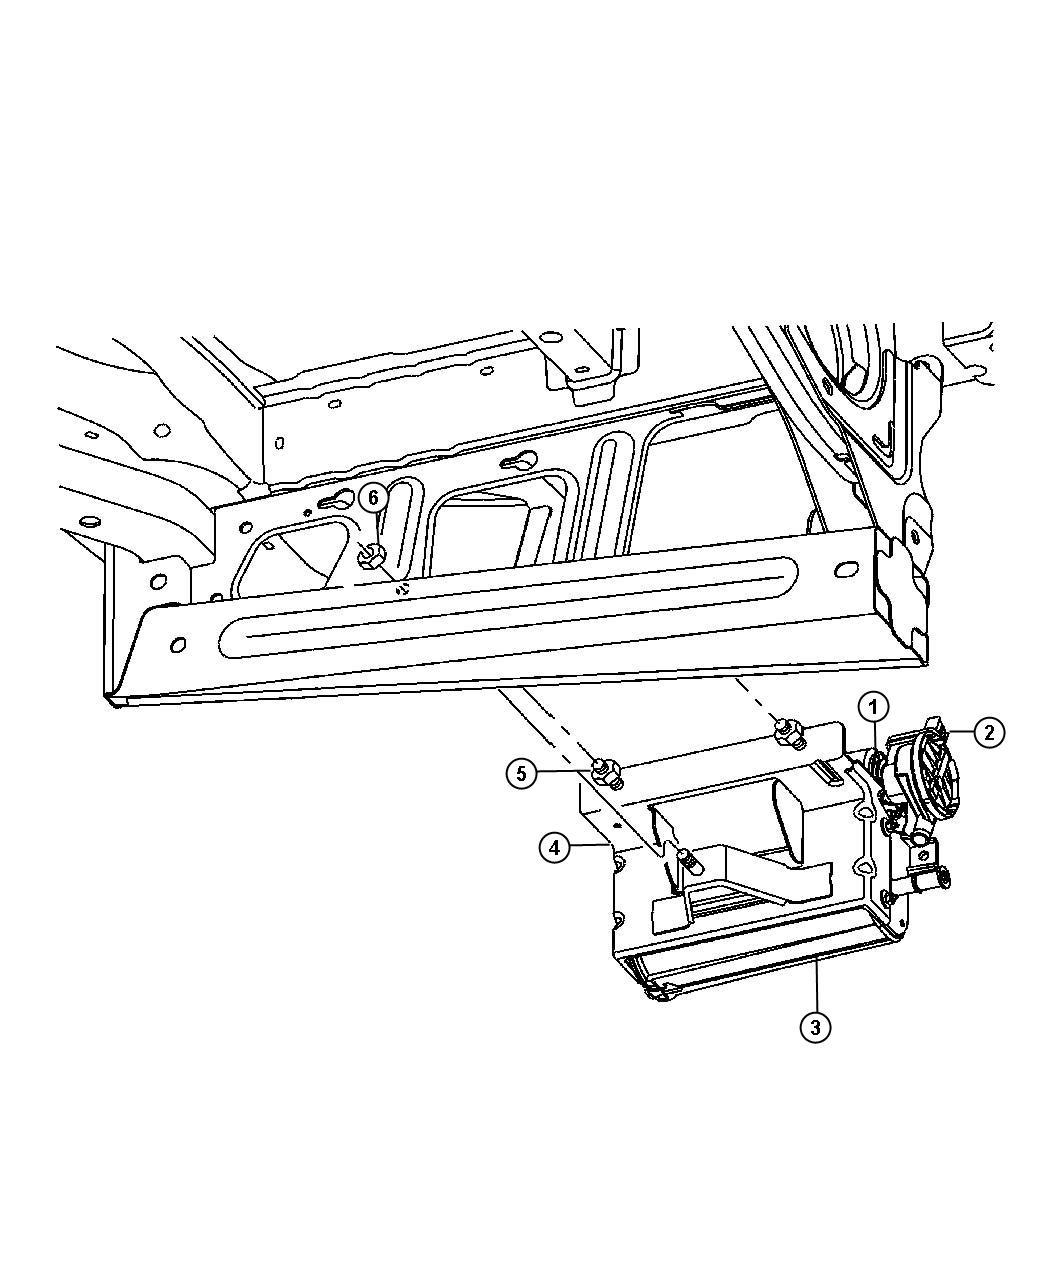 Jeep Grand Cherokee Canister Vapor Leak Detection